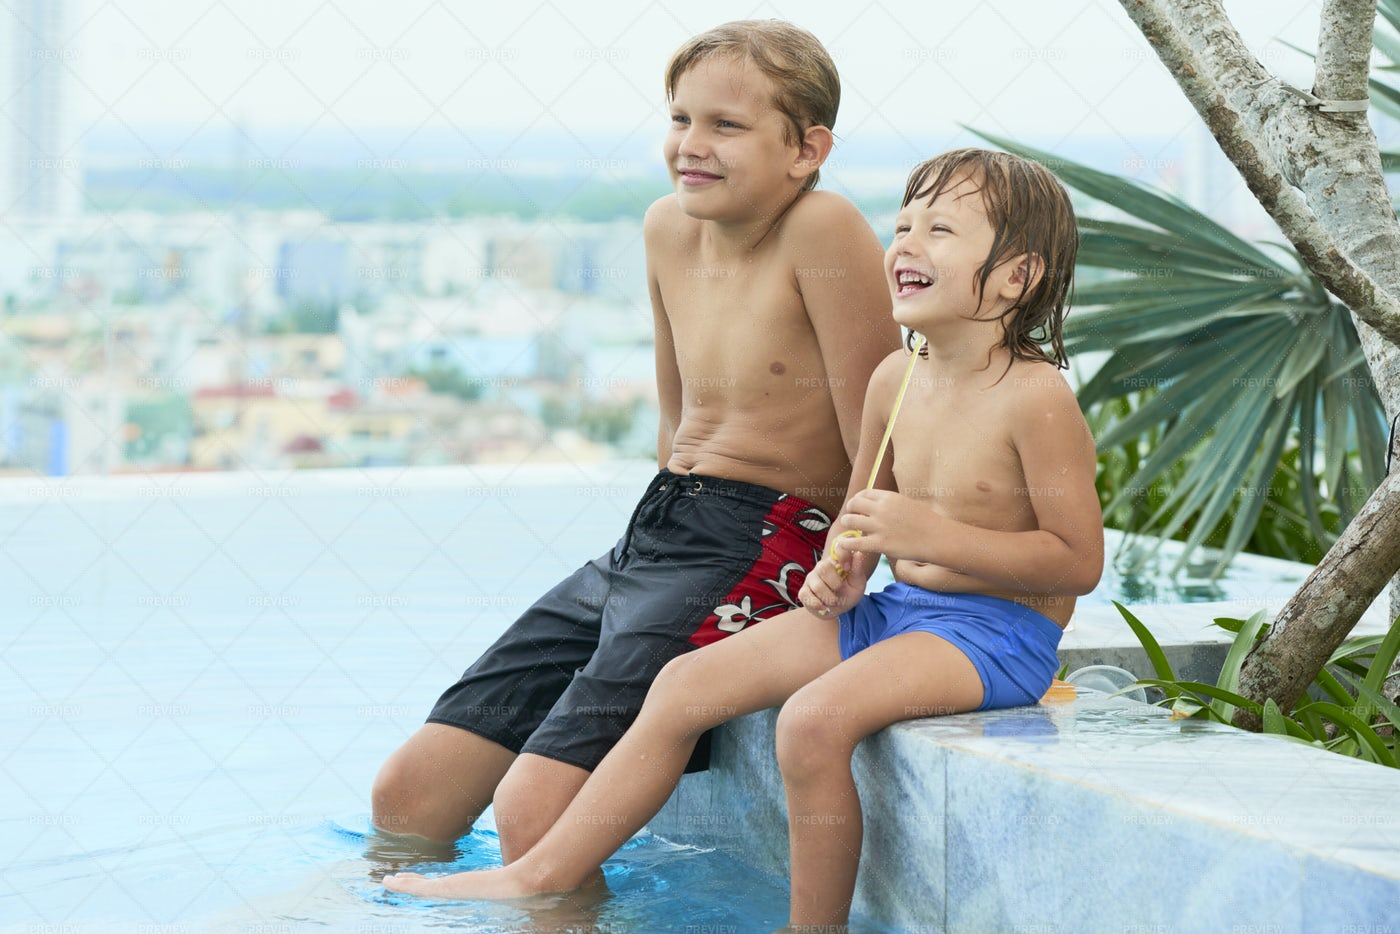 Kids In Swimming Pool: Stock Photos